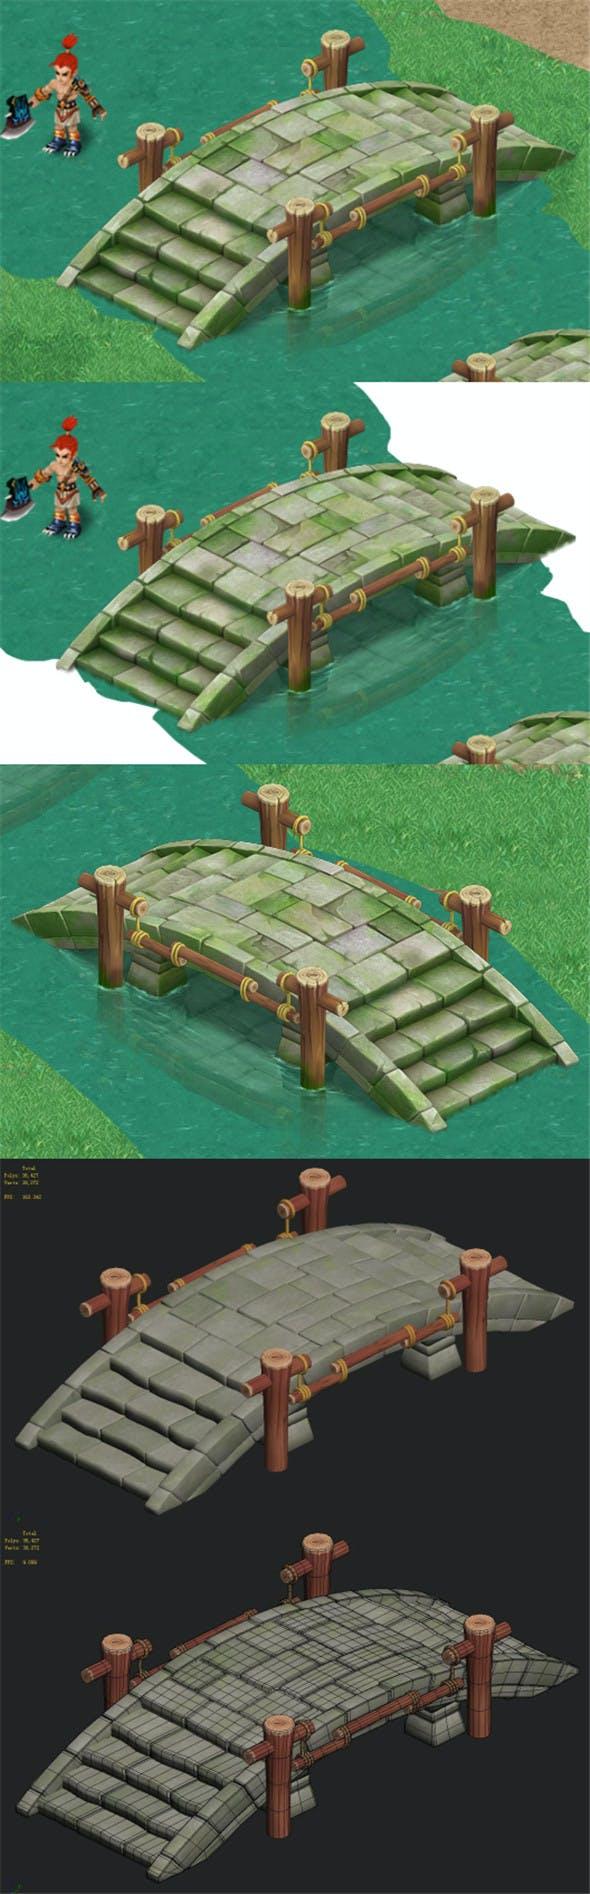 Cartoon version - stone bridge 011 - 3DOcean Item for Sale